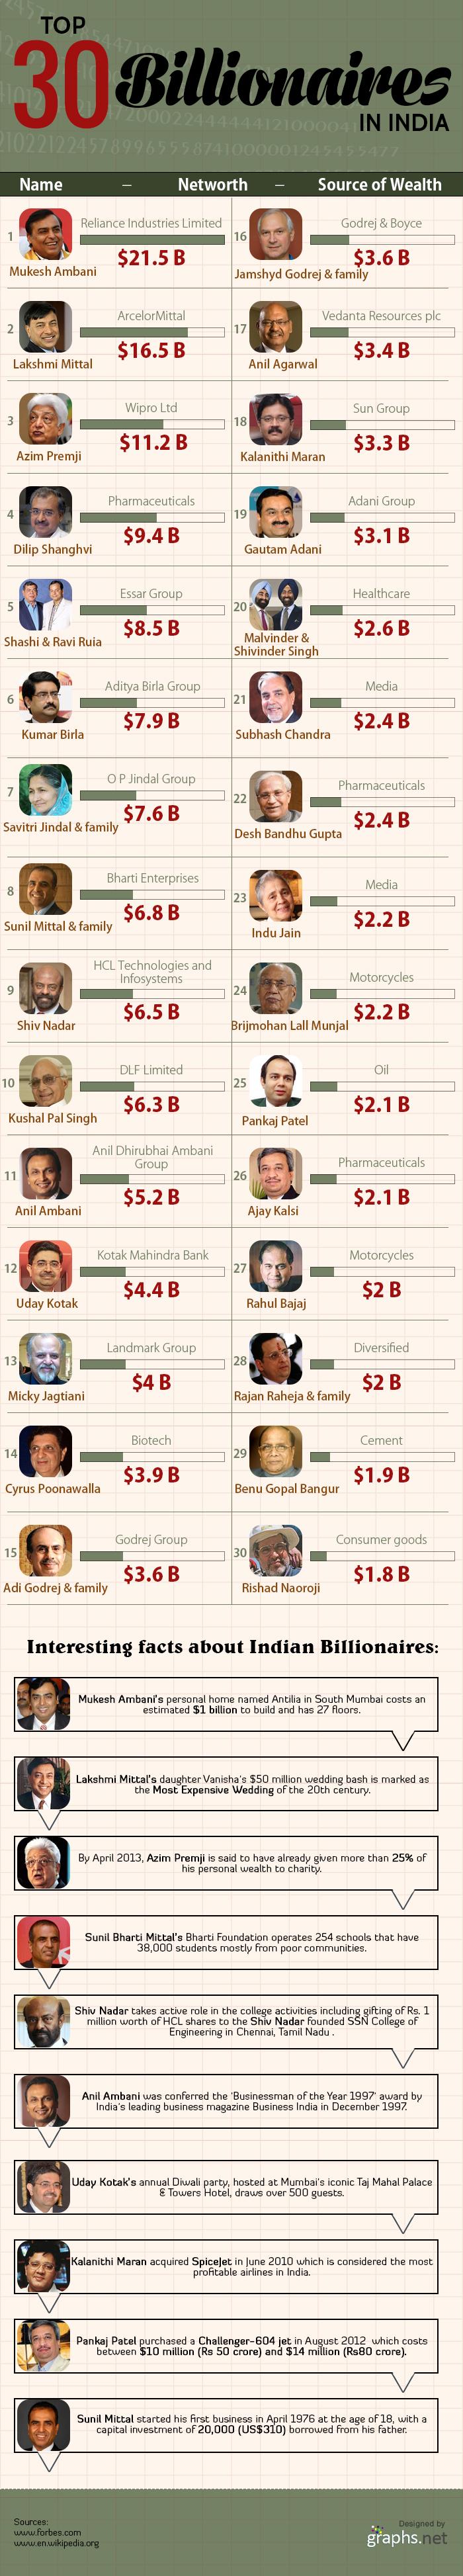 Top 30 Billionaires of India